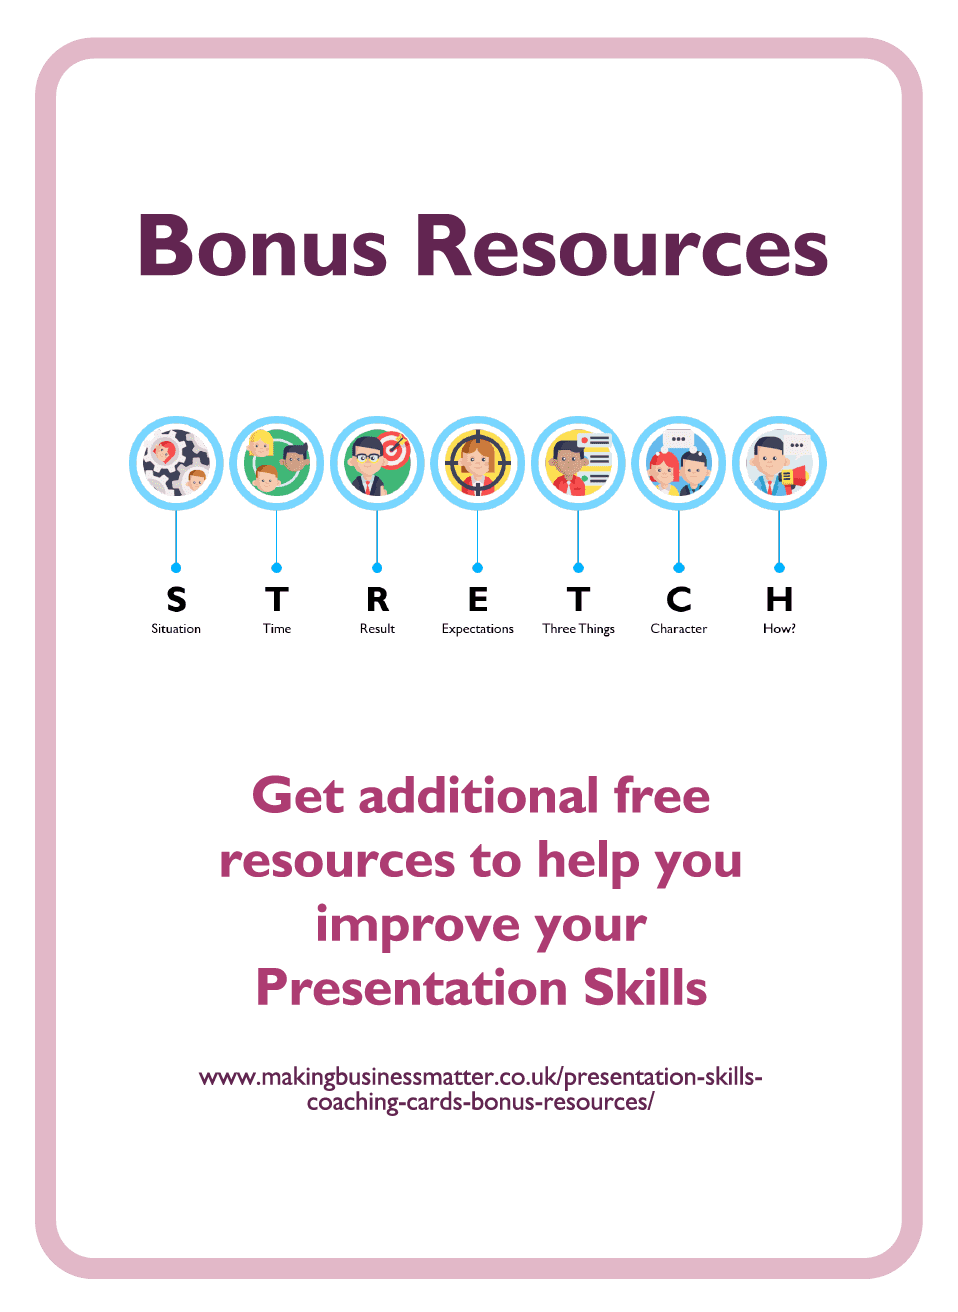 Coaching card titled Bonus Resources